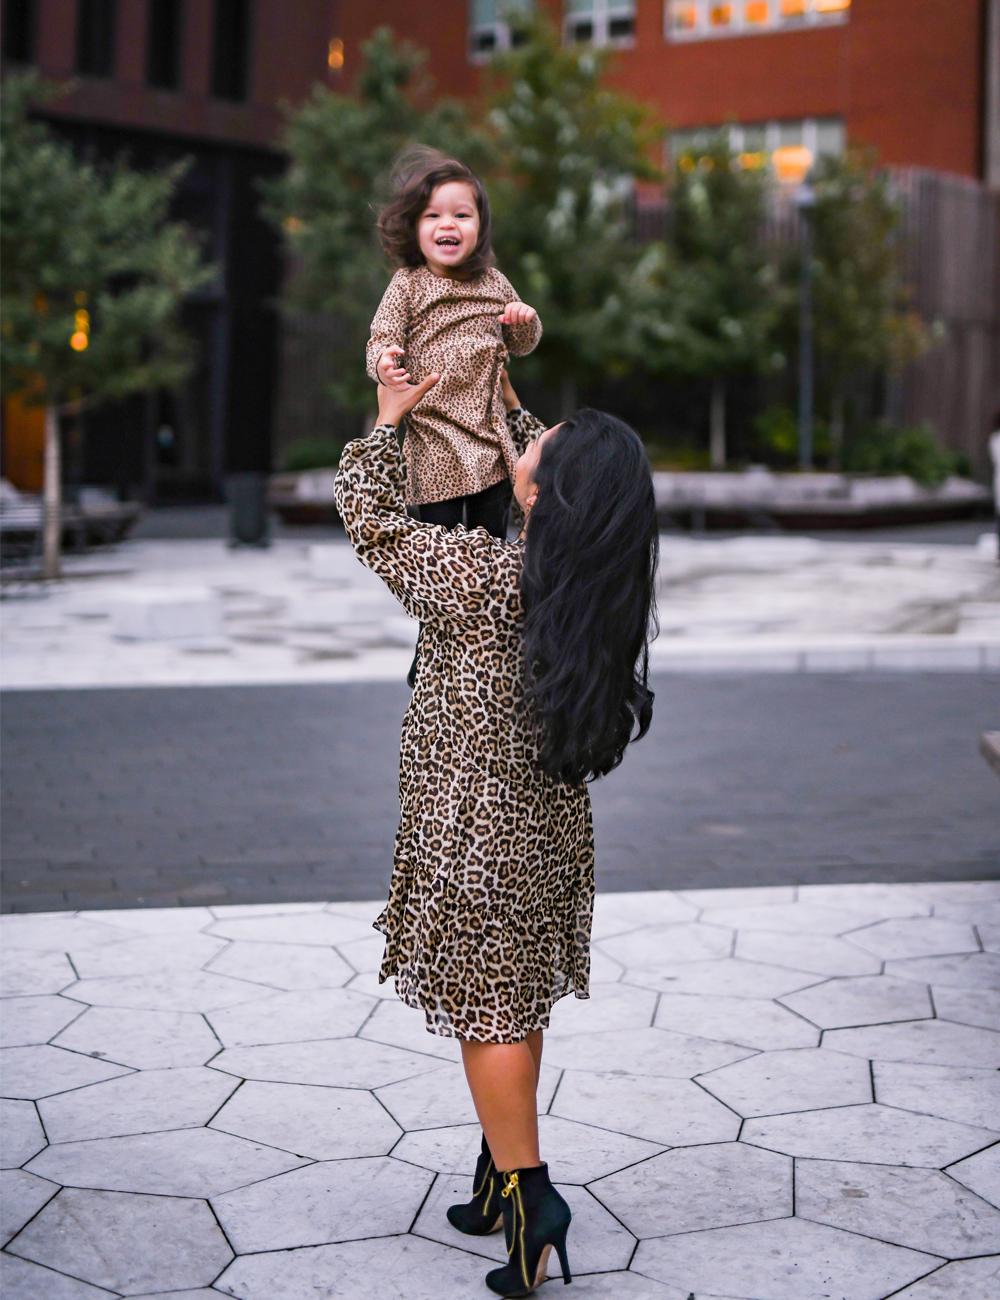 Maxine is looking super cute in her H&M leopard print dress